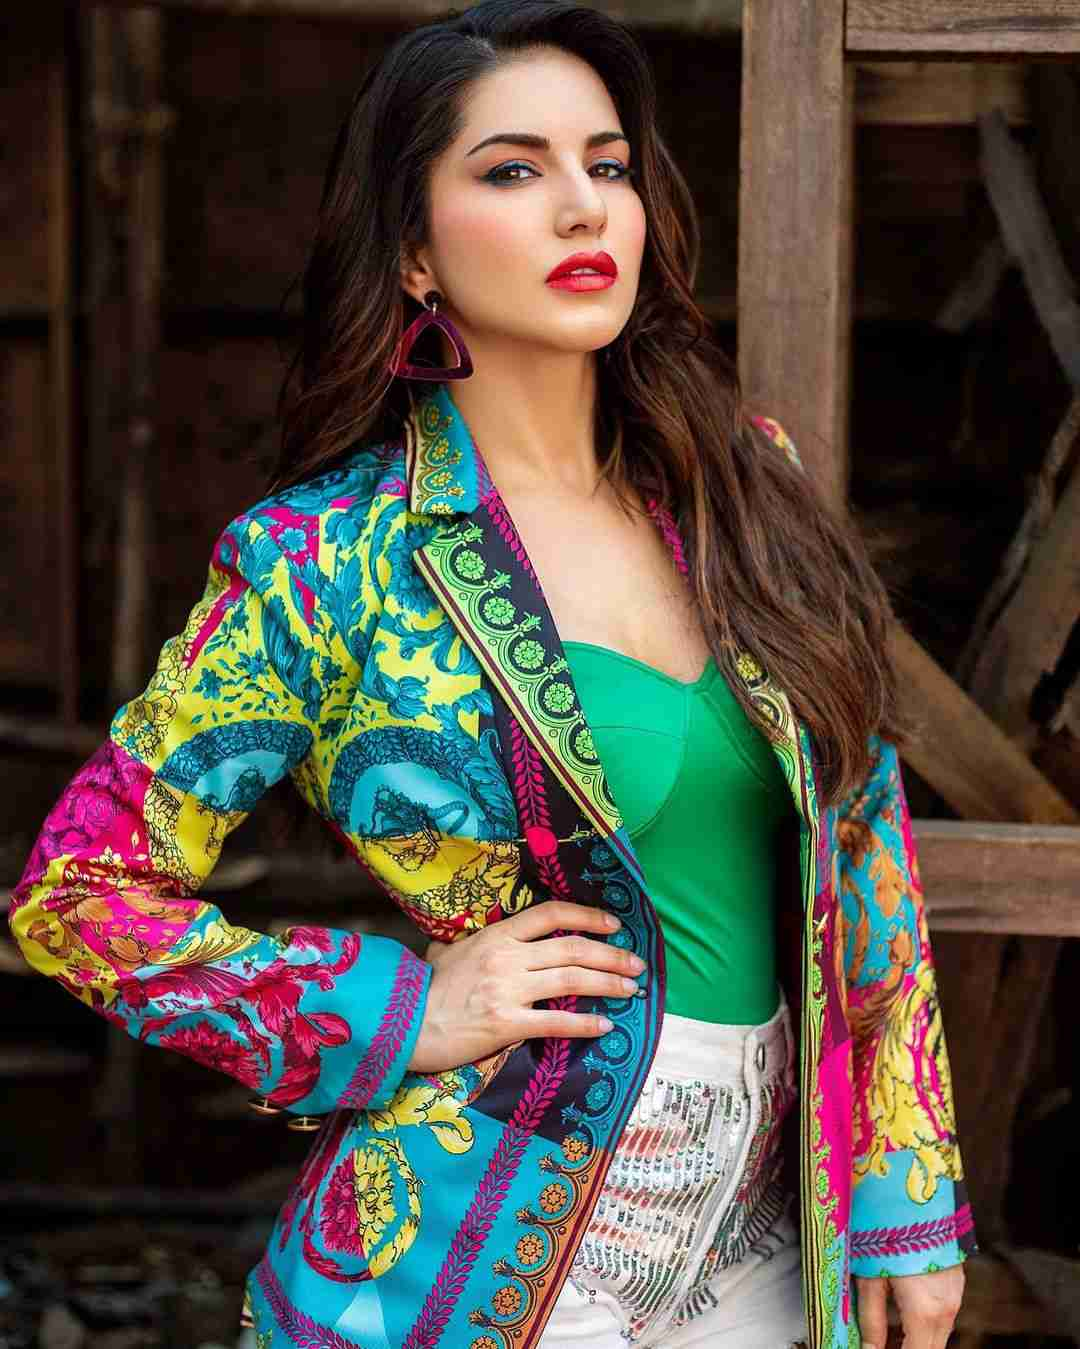 Sunny Leone Bio, Wiki, Age, Figure, Net Worth, Height, Pics